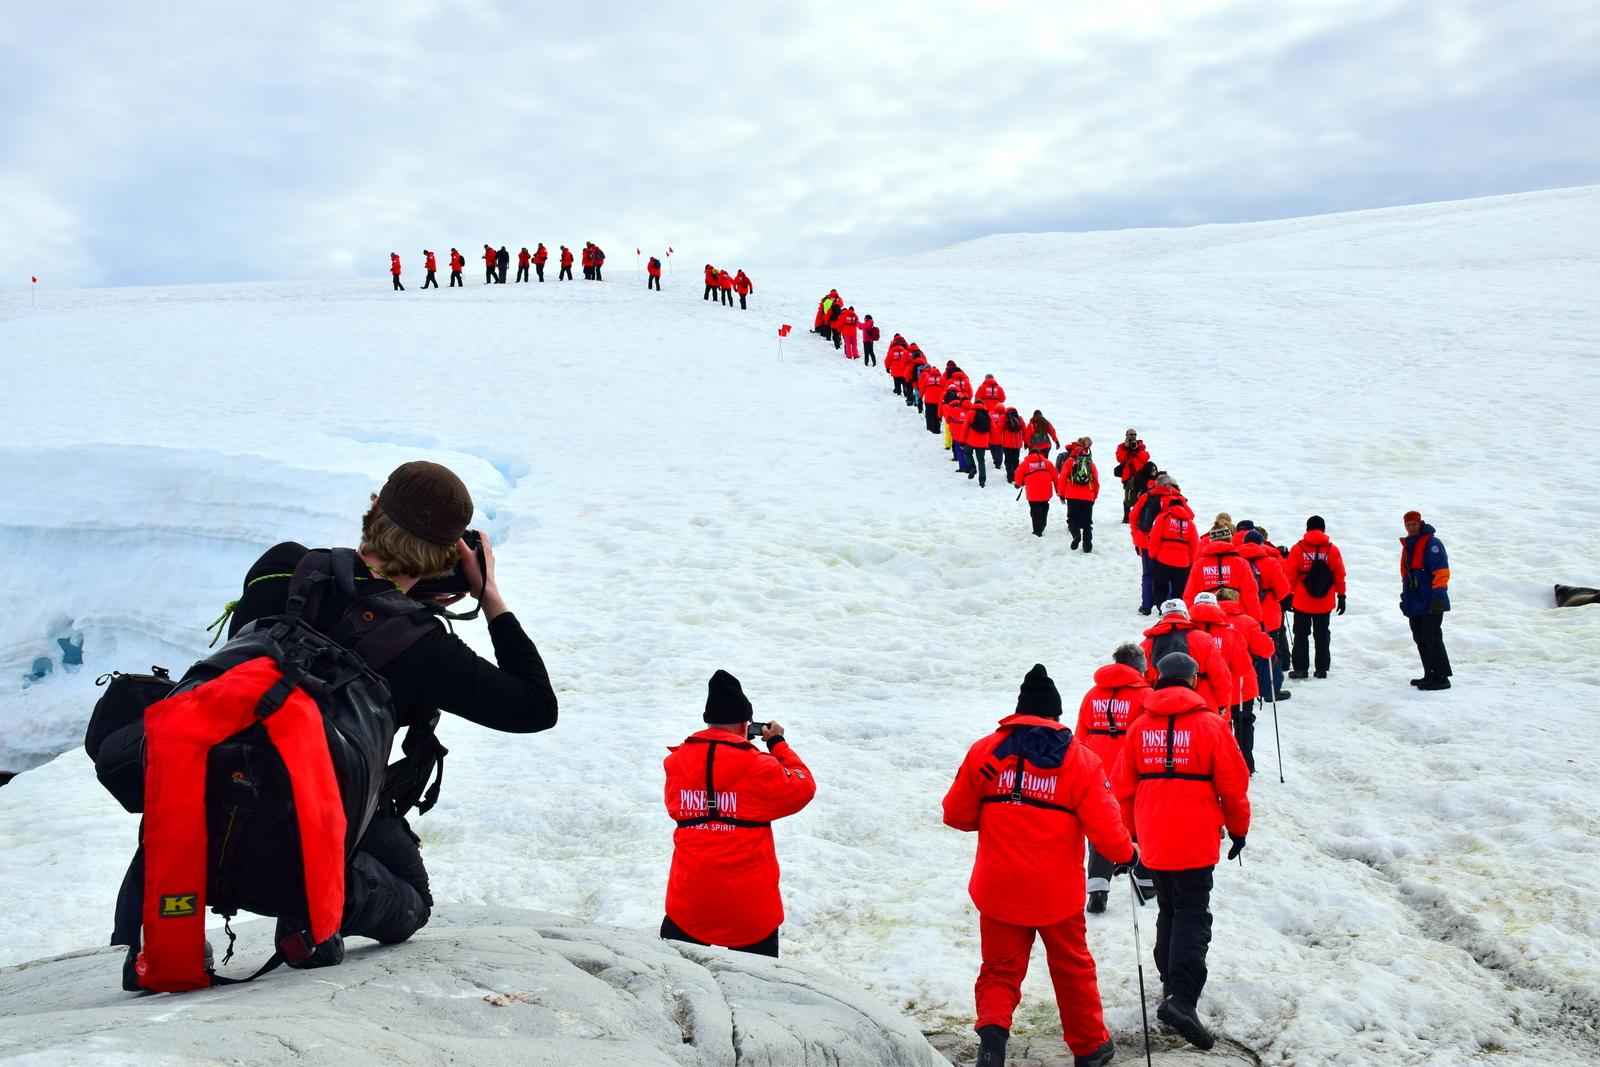 Antarctica travellers group in Hydruga Rocks Antarctica